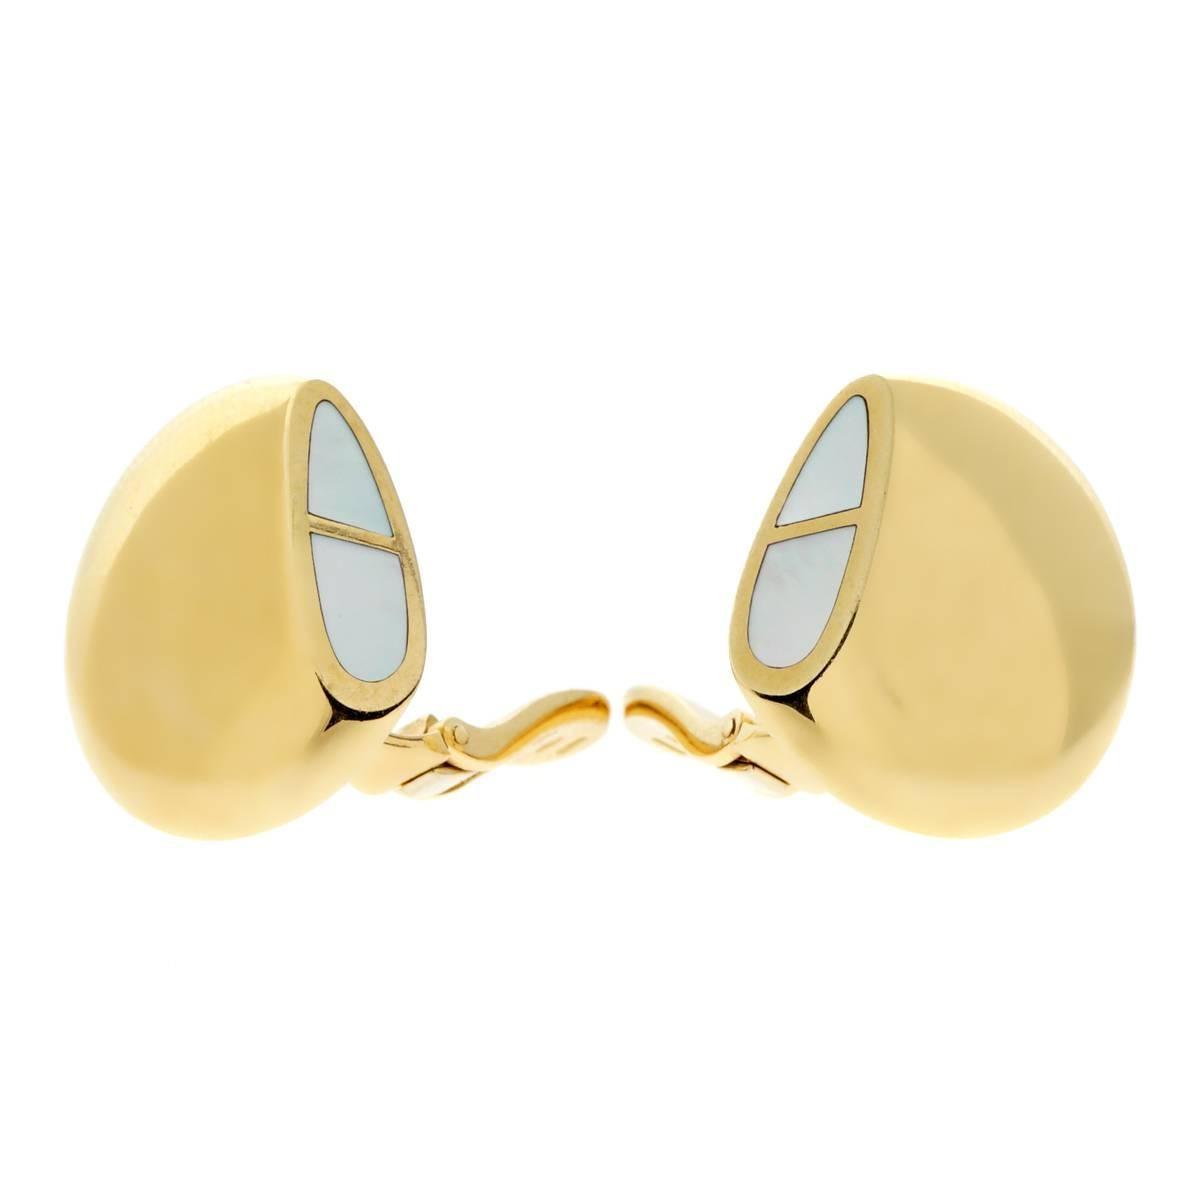 Hermes Gold Mother-of-Pearl Earrings